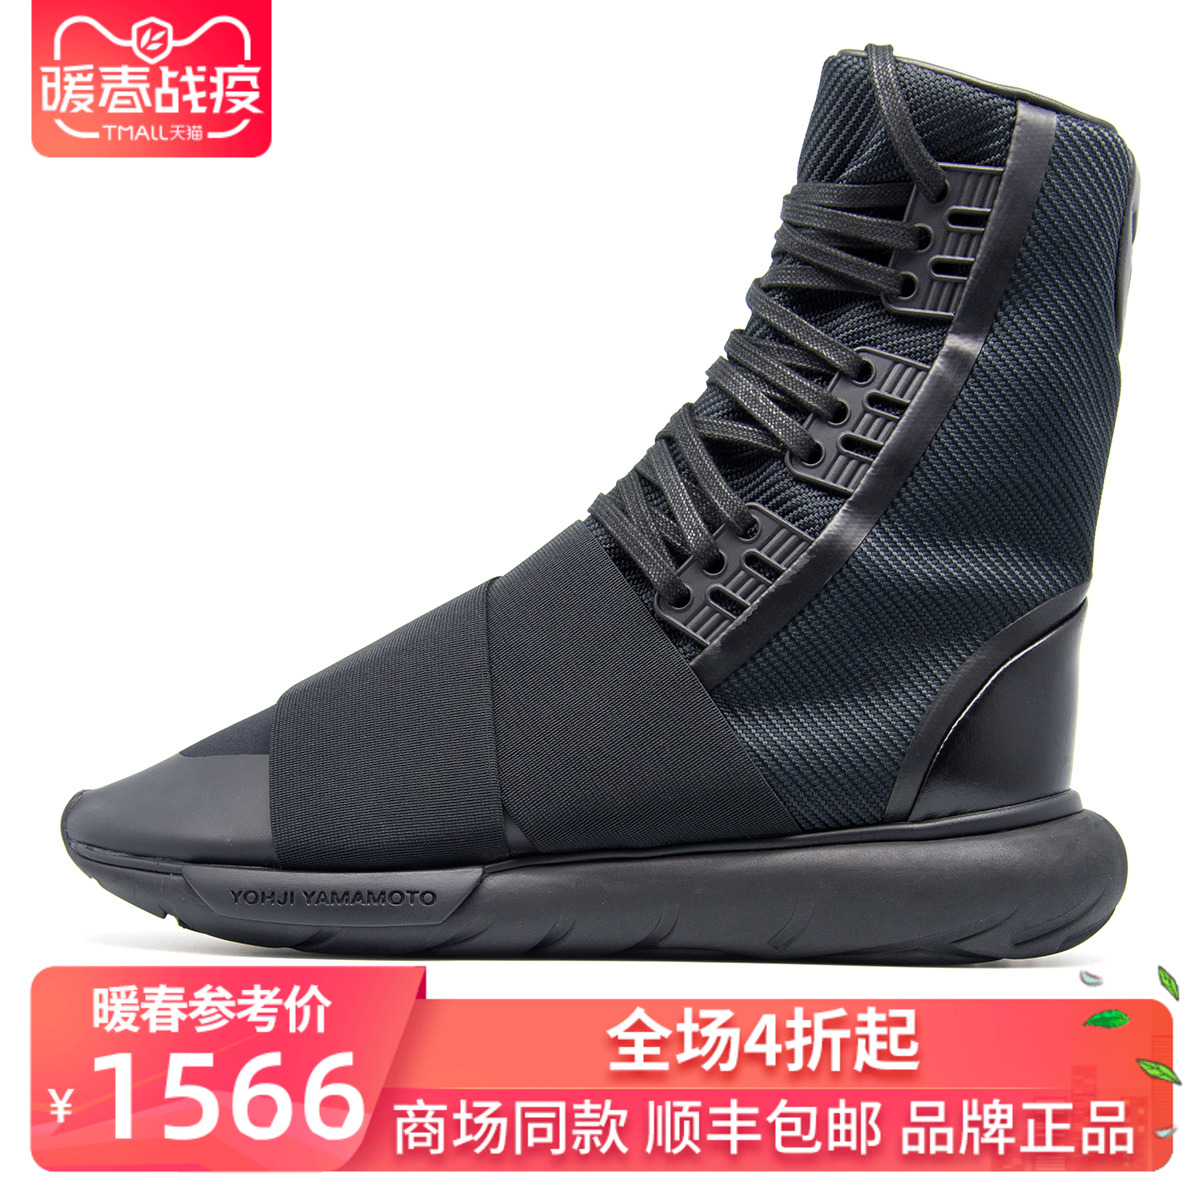 Y-3男子休闲运动靴子  y3 QASA BOOT  BB4802